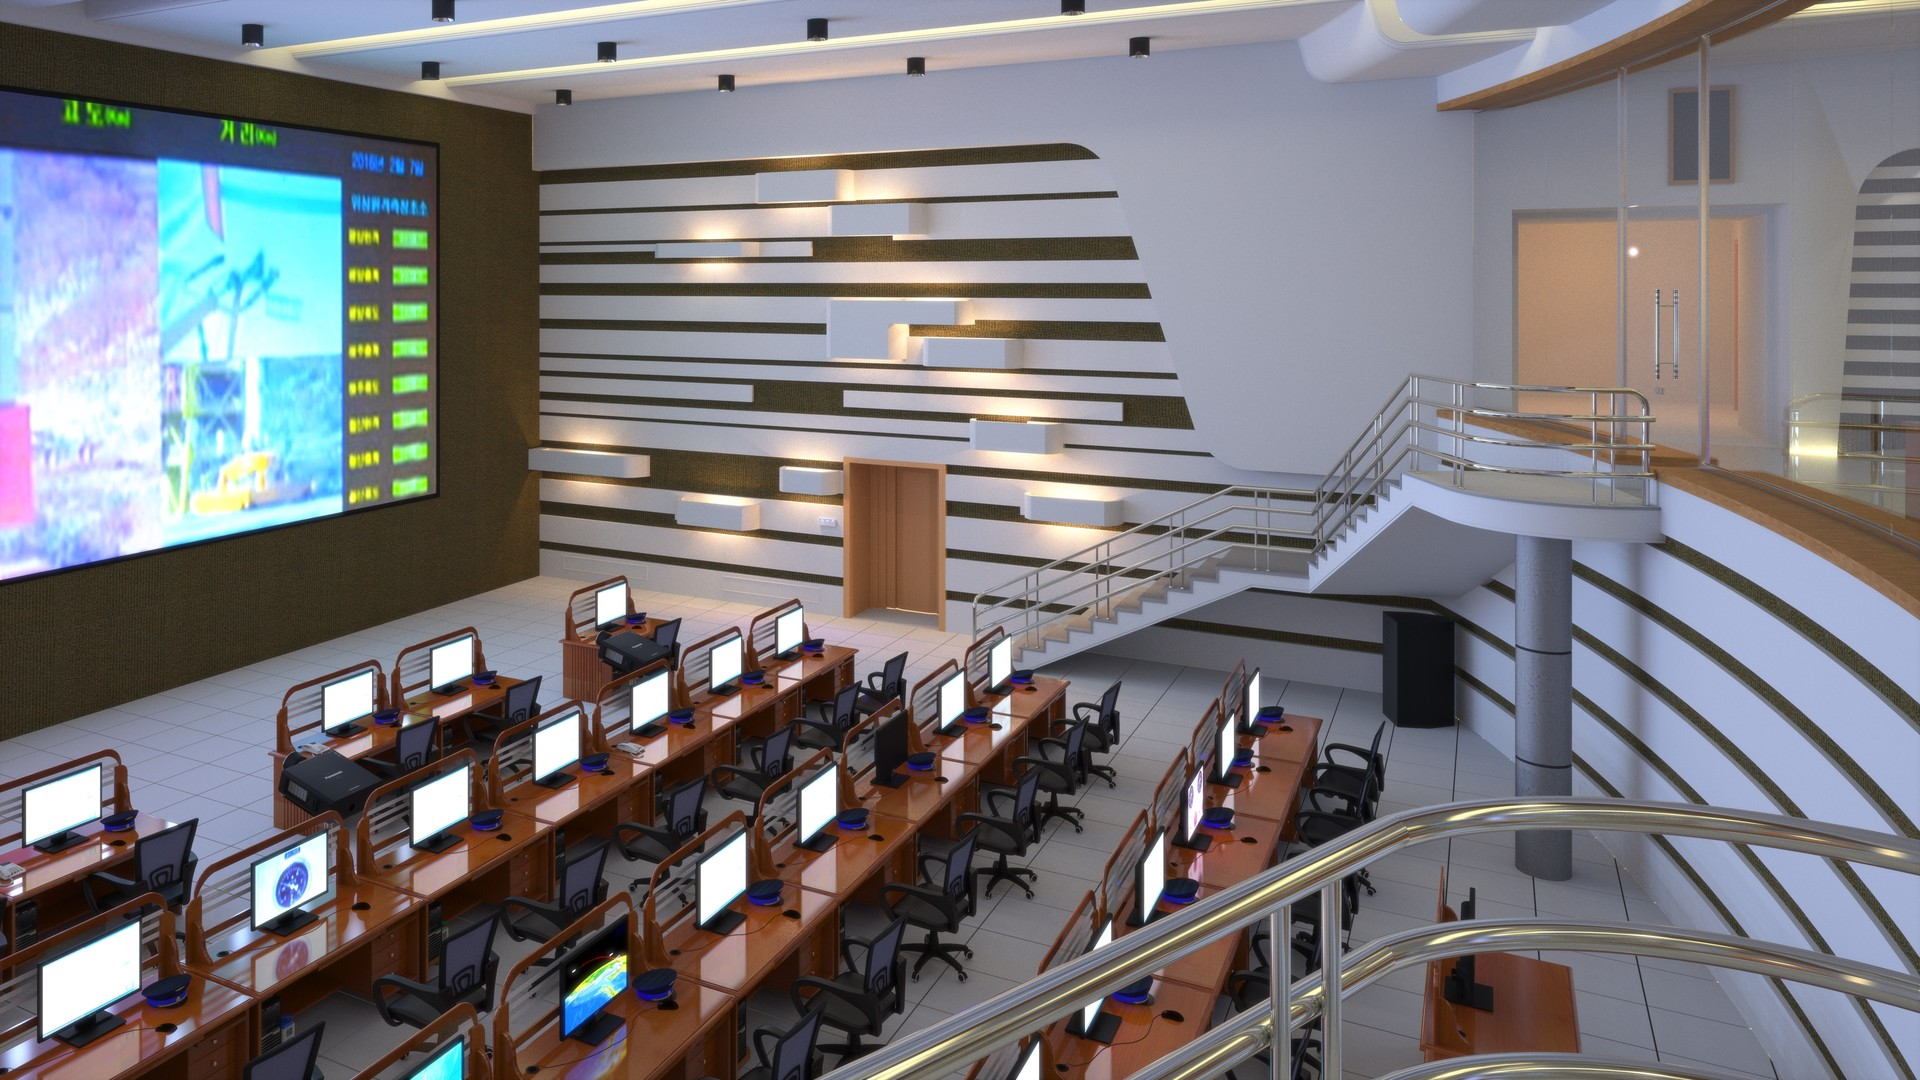 Duane kemp 12 control center balcony stairs dk 01 a